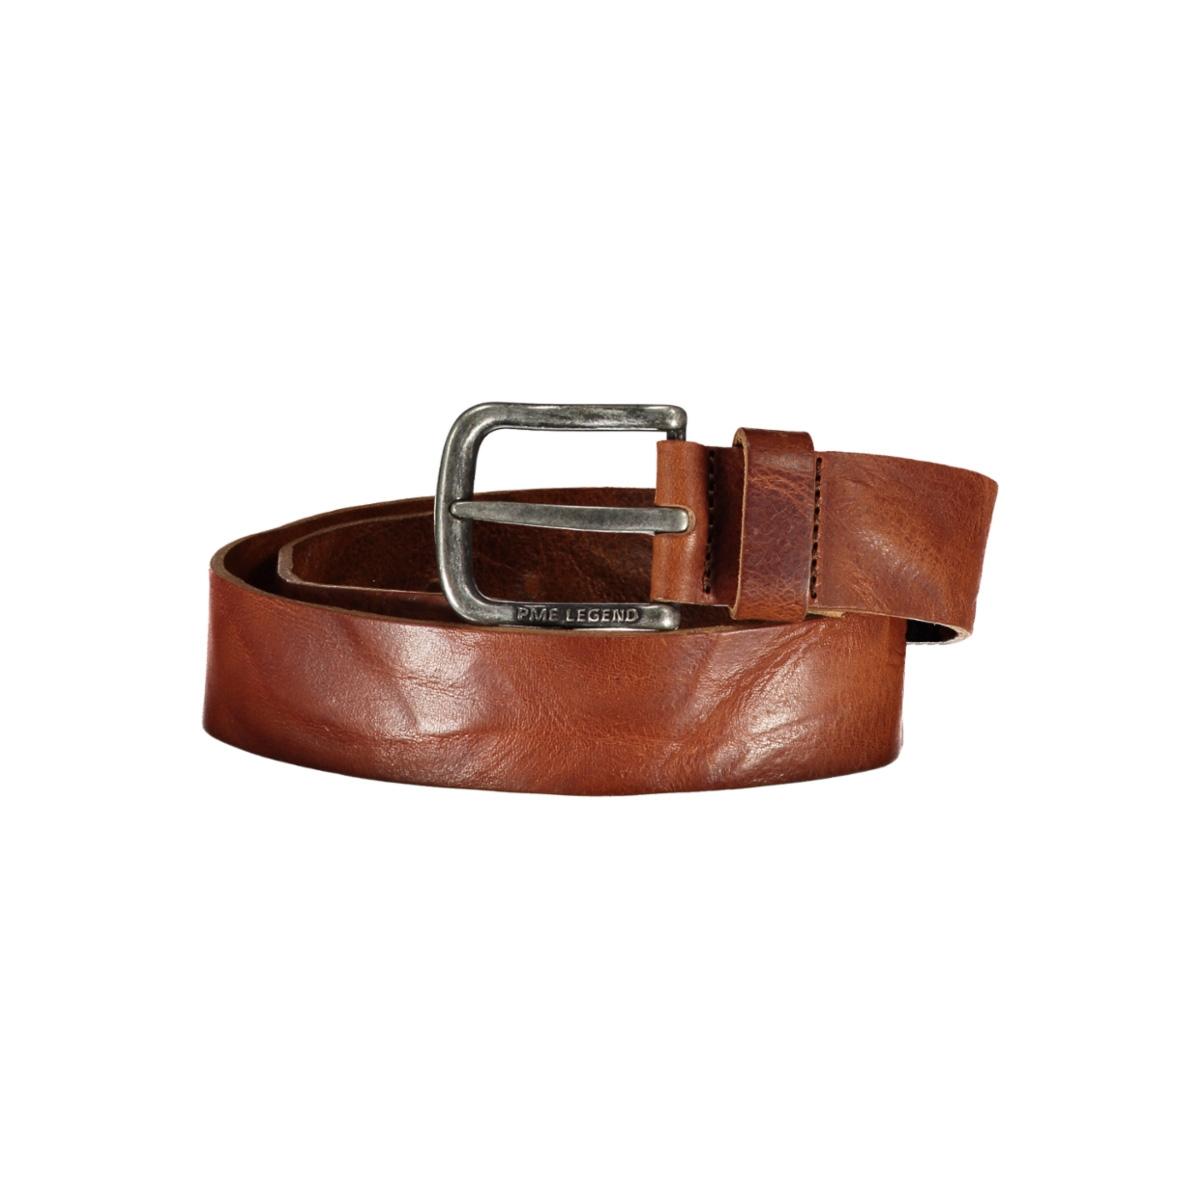 leather belt pbe00113 pme legend riem 750